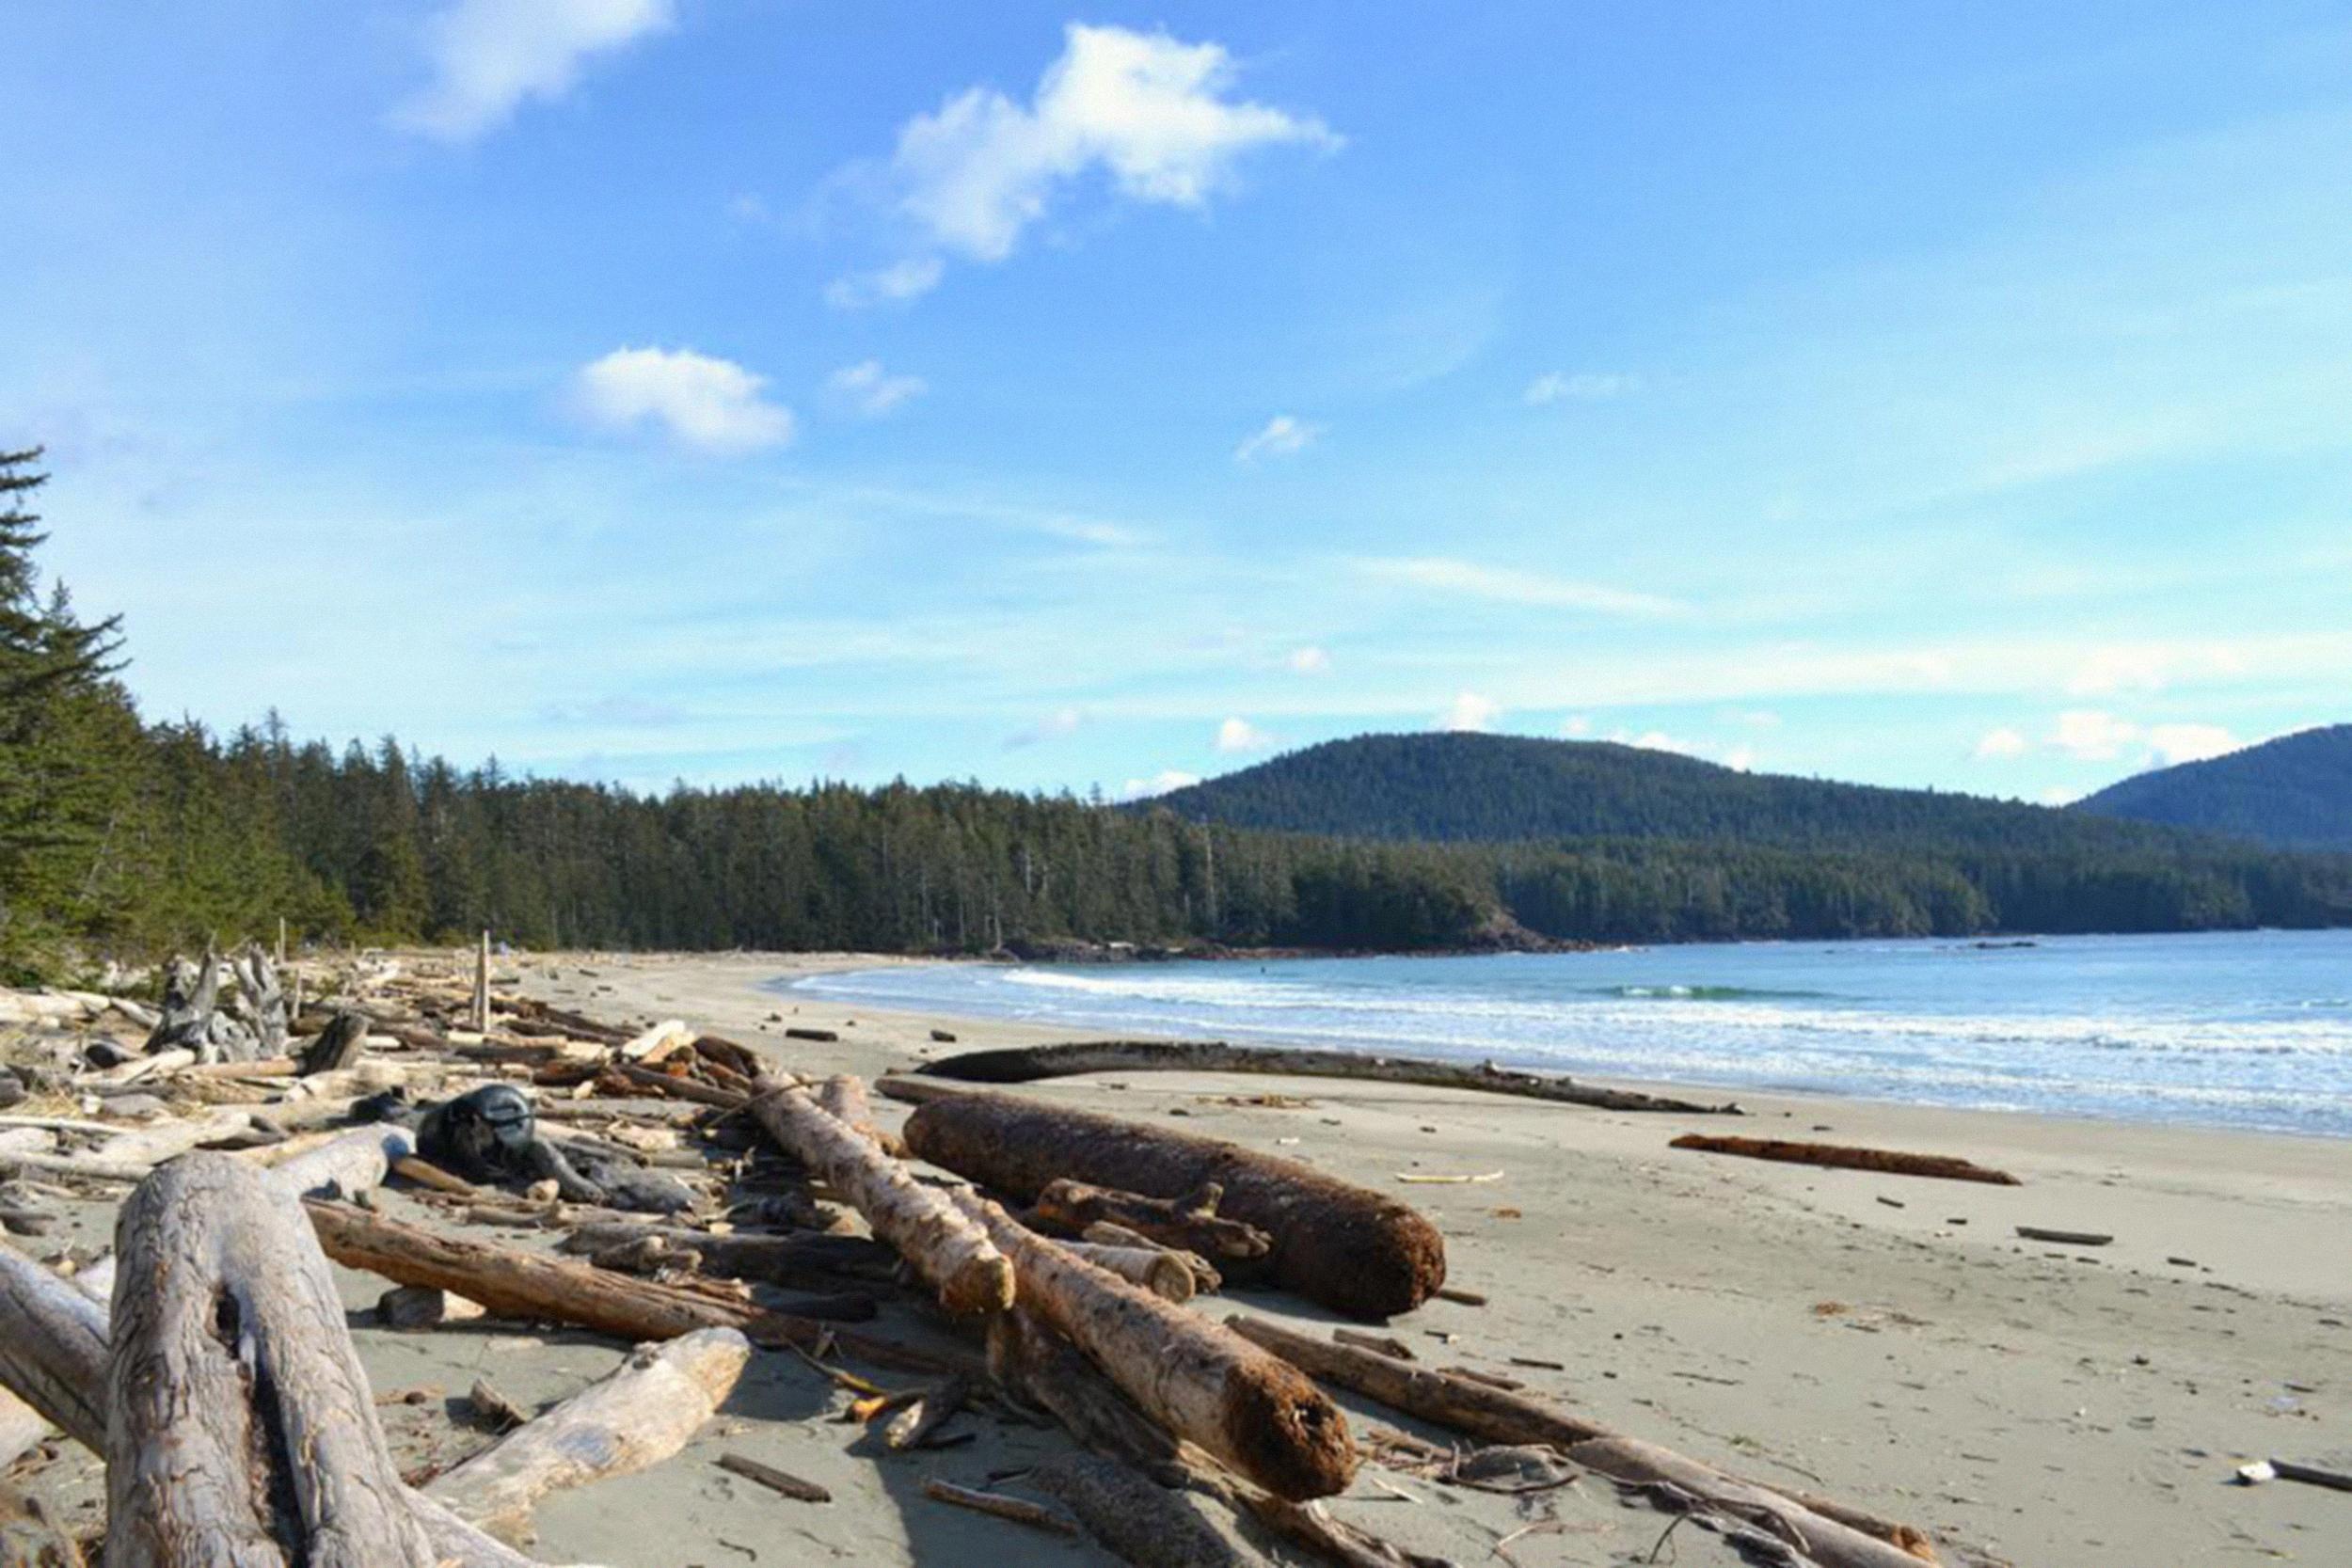 grant bay 9 logs sand ocean_2500.jpg